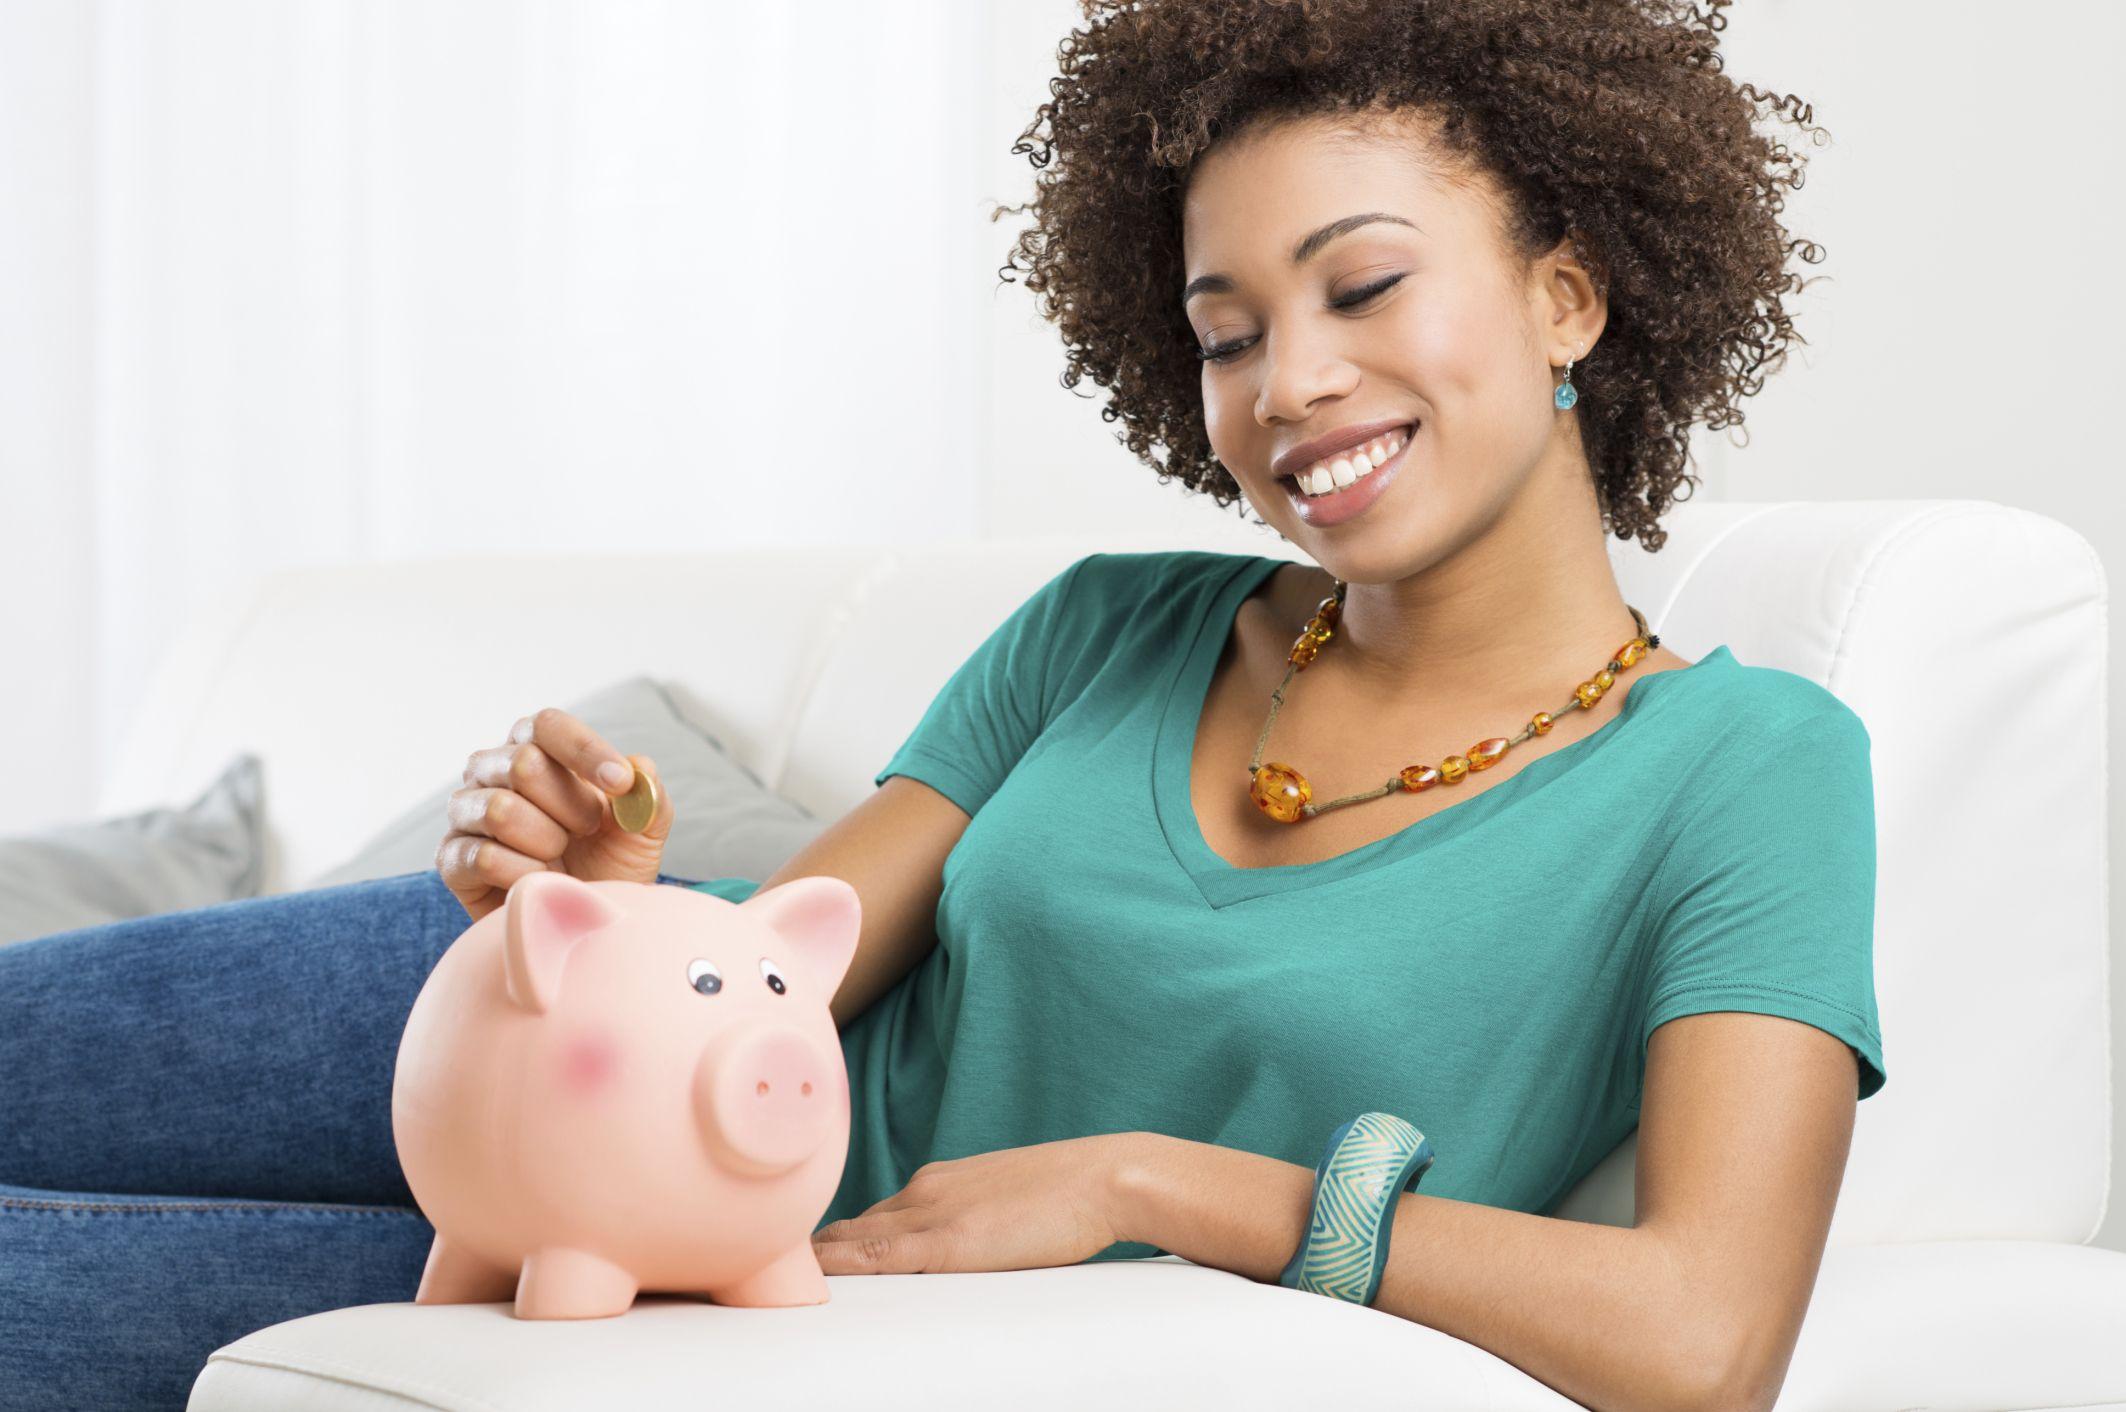 Woman Putting Coin In Piggybank